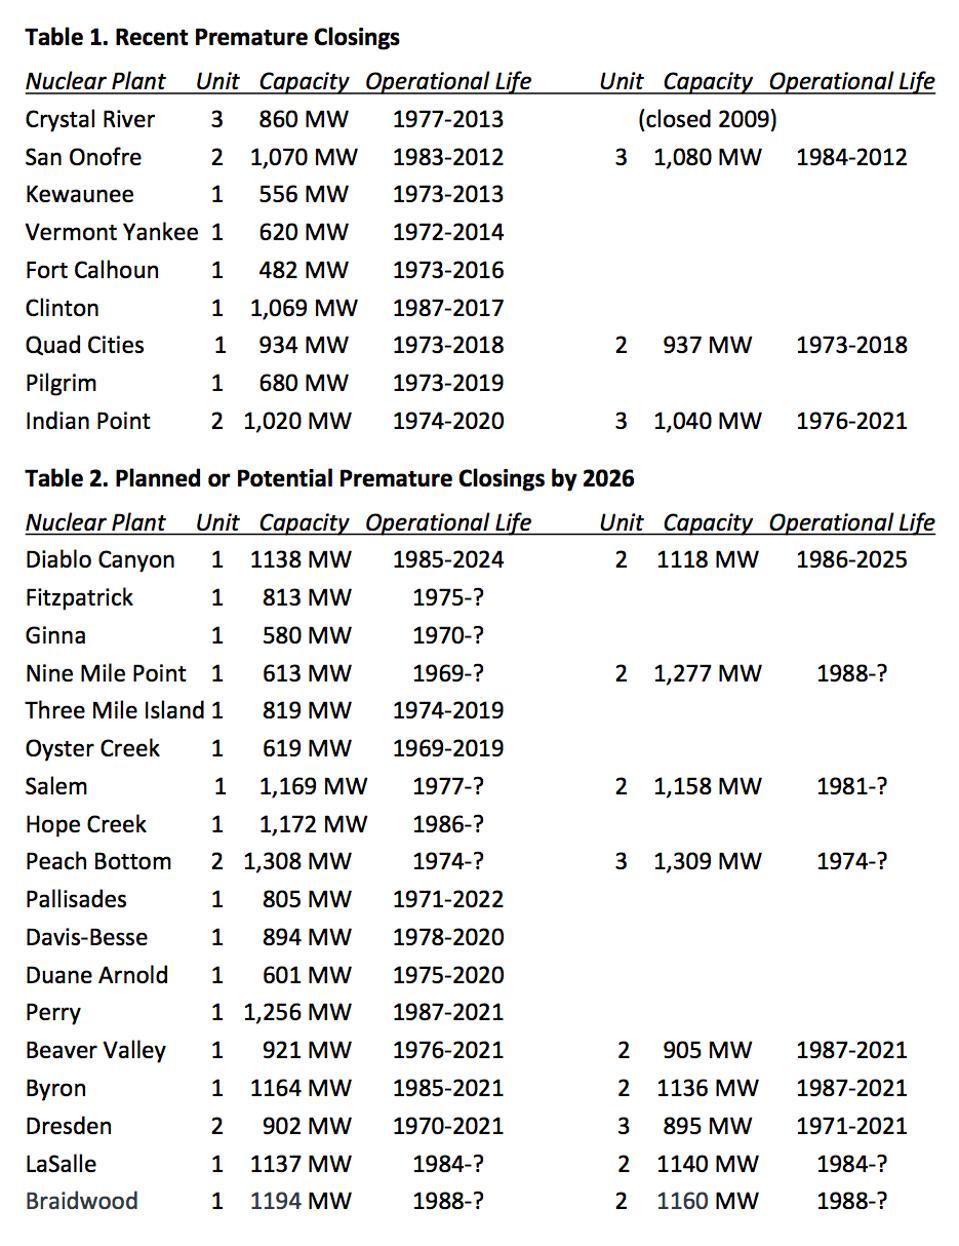 Table of closings